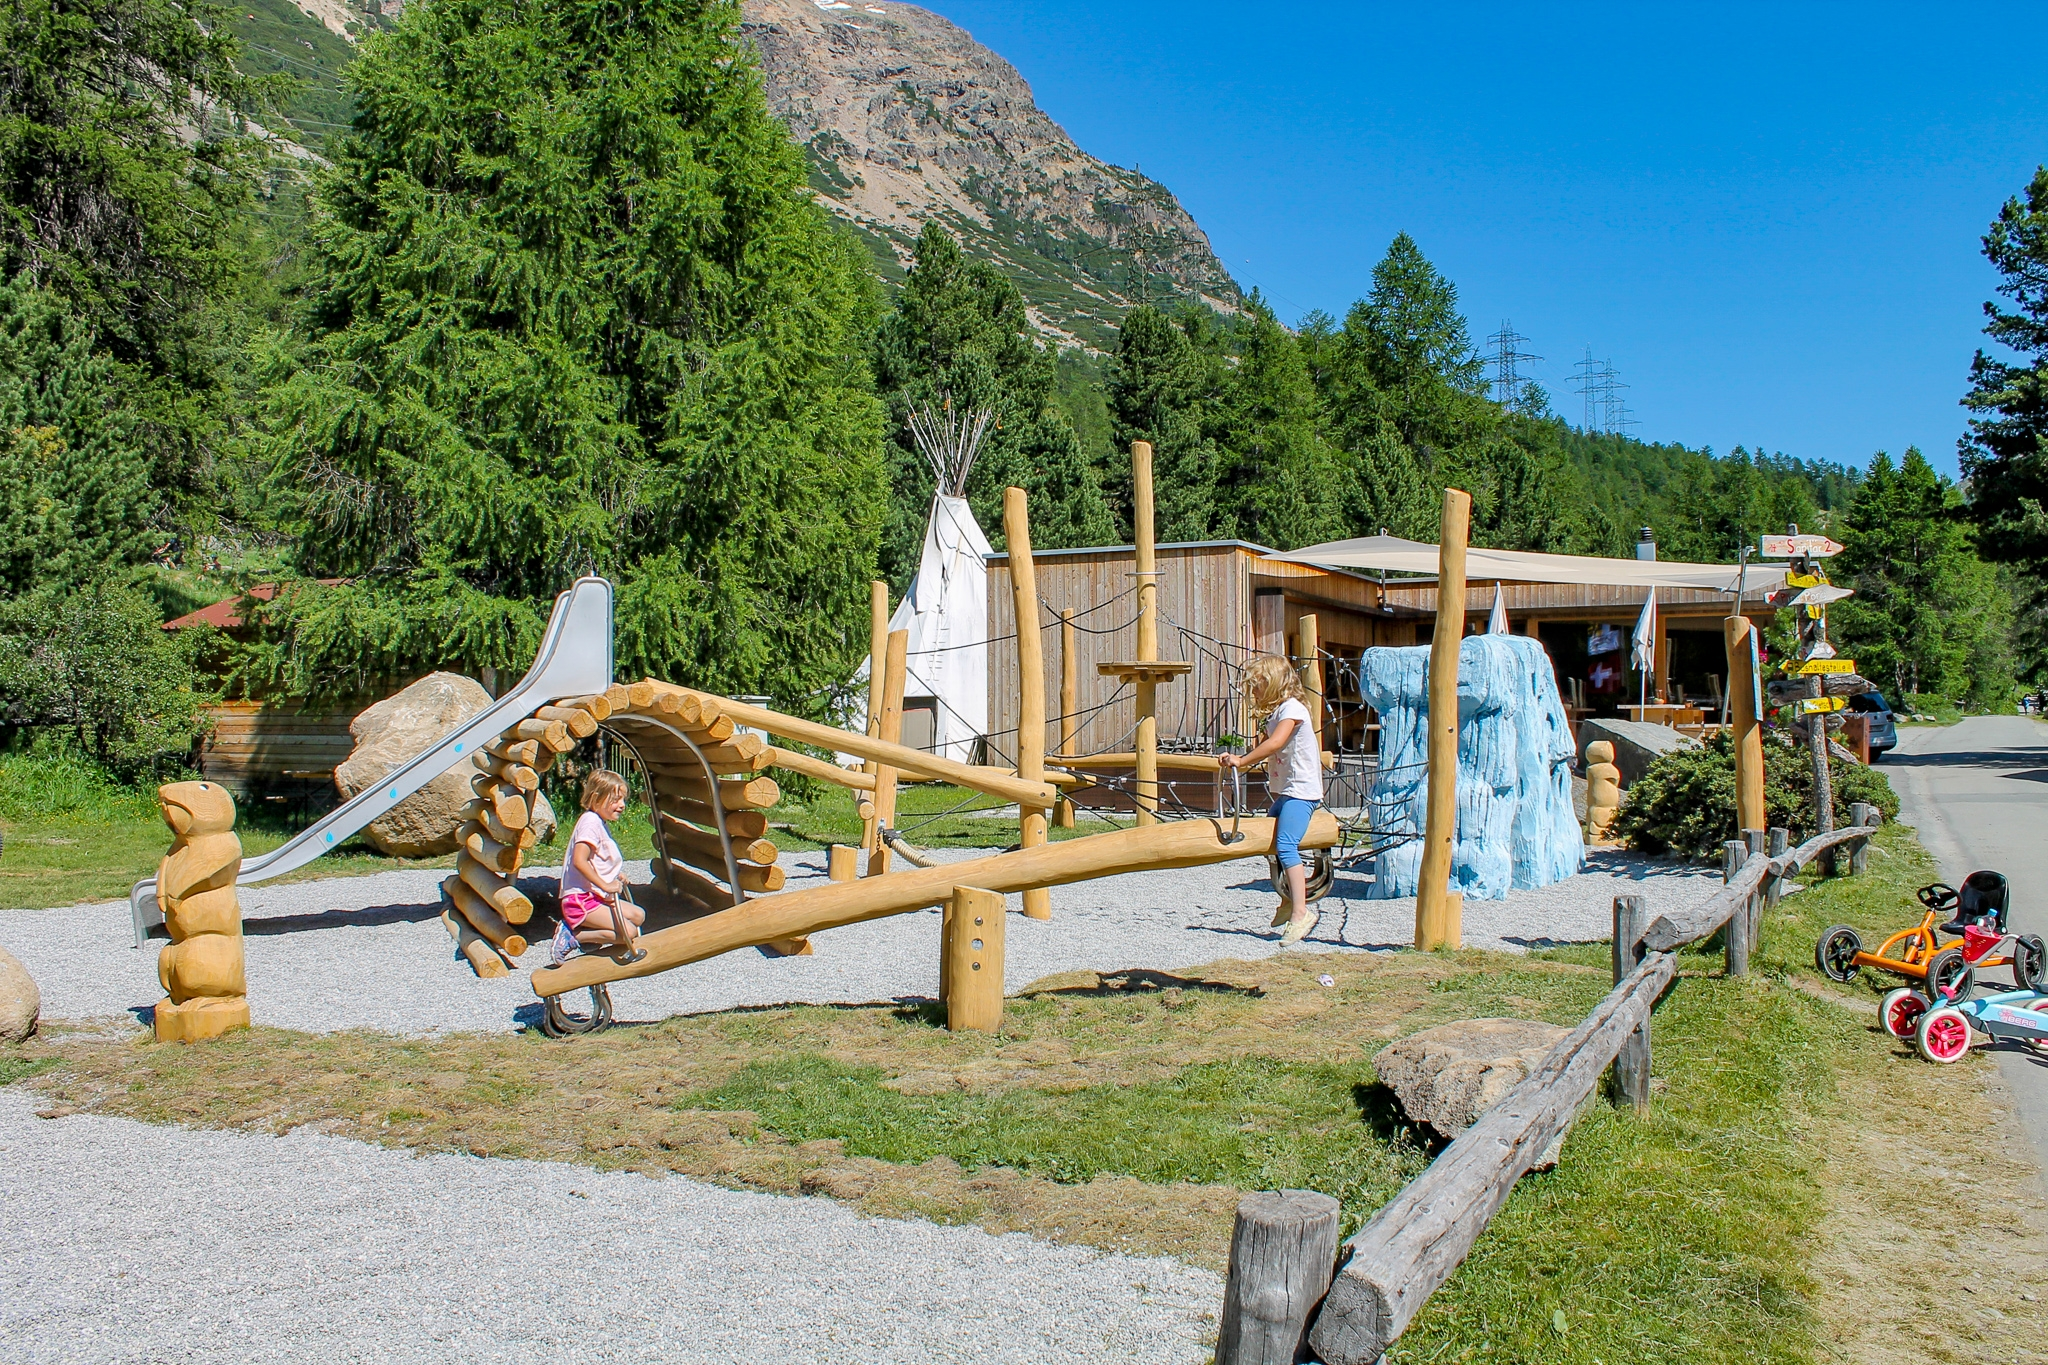 Kinderspielplatz Camping Morteratsch Slide 1